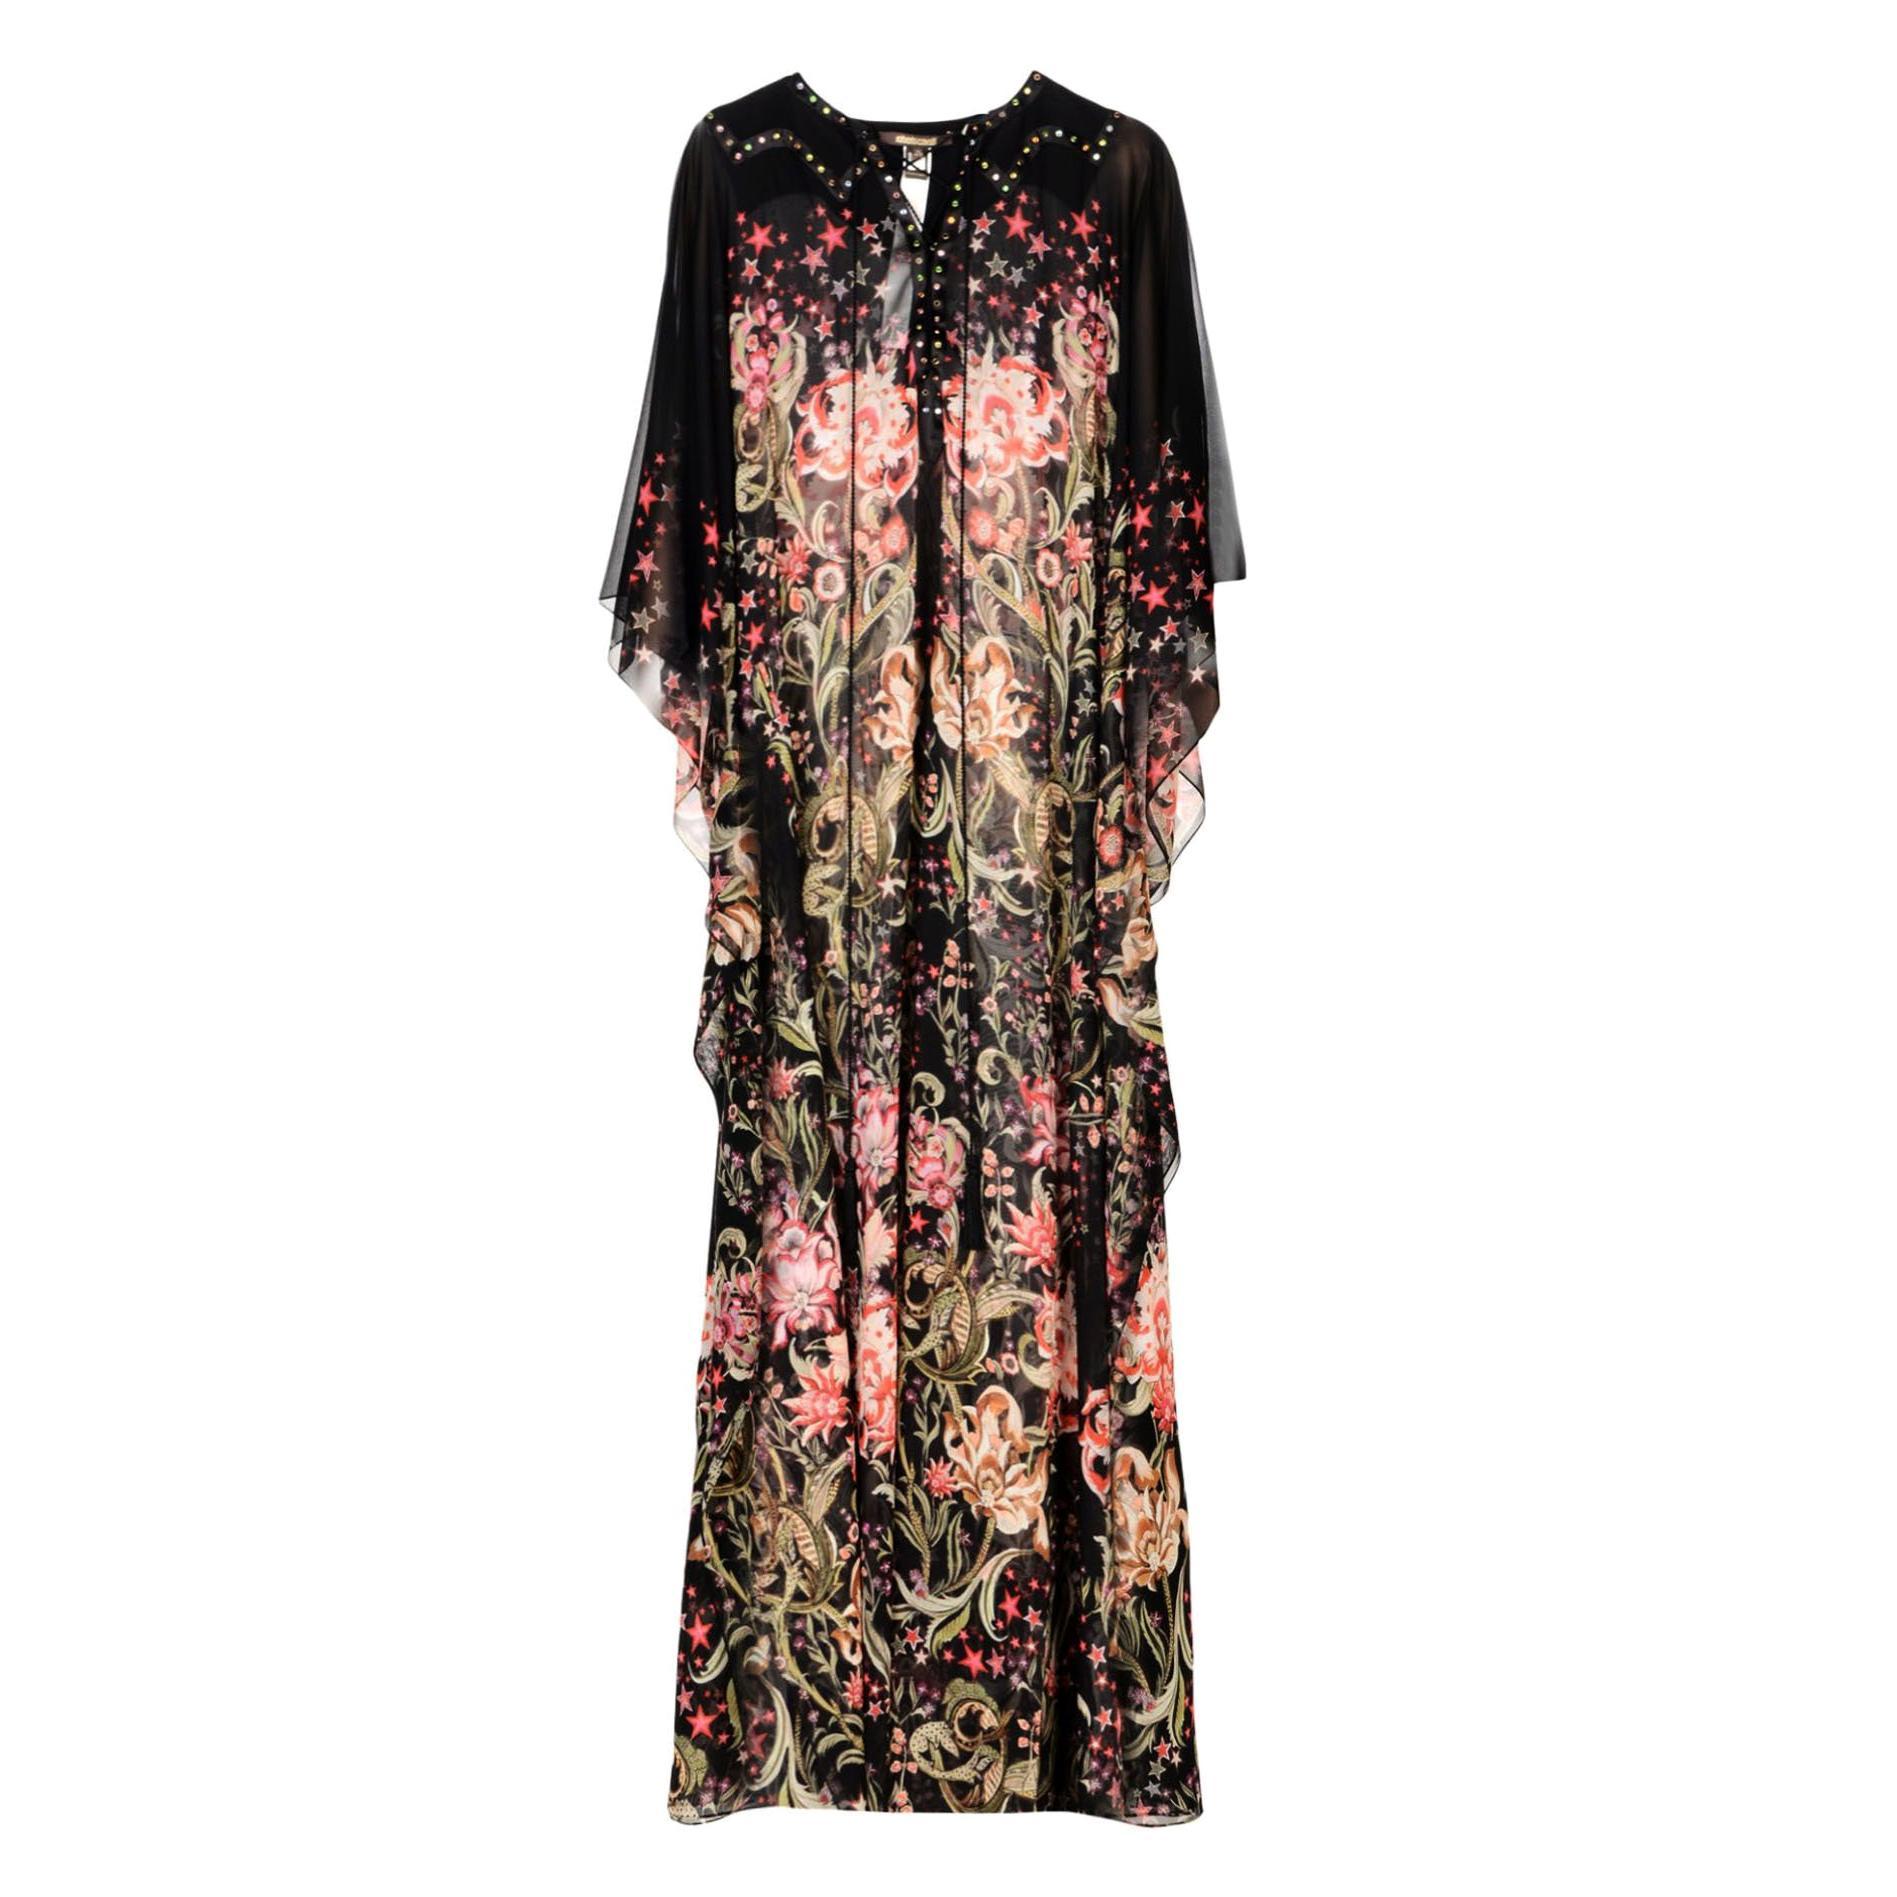 New Roberto Cavalli 100% Silk Studded Floral Caftan-Style Long Dress w / Belt 40